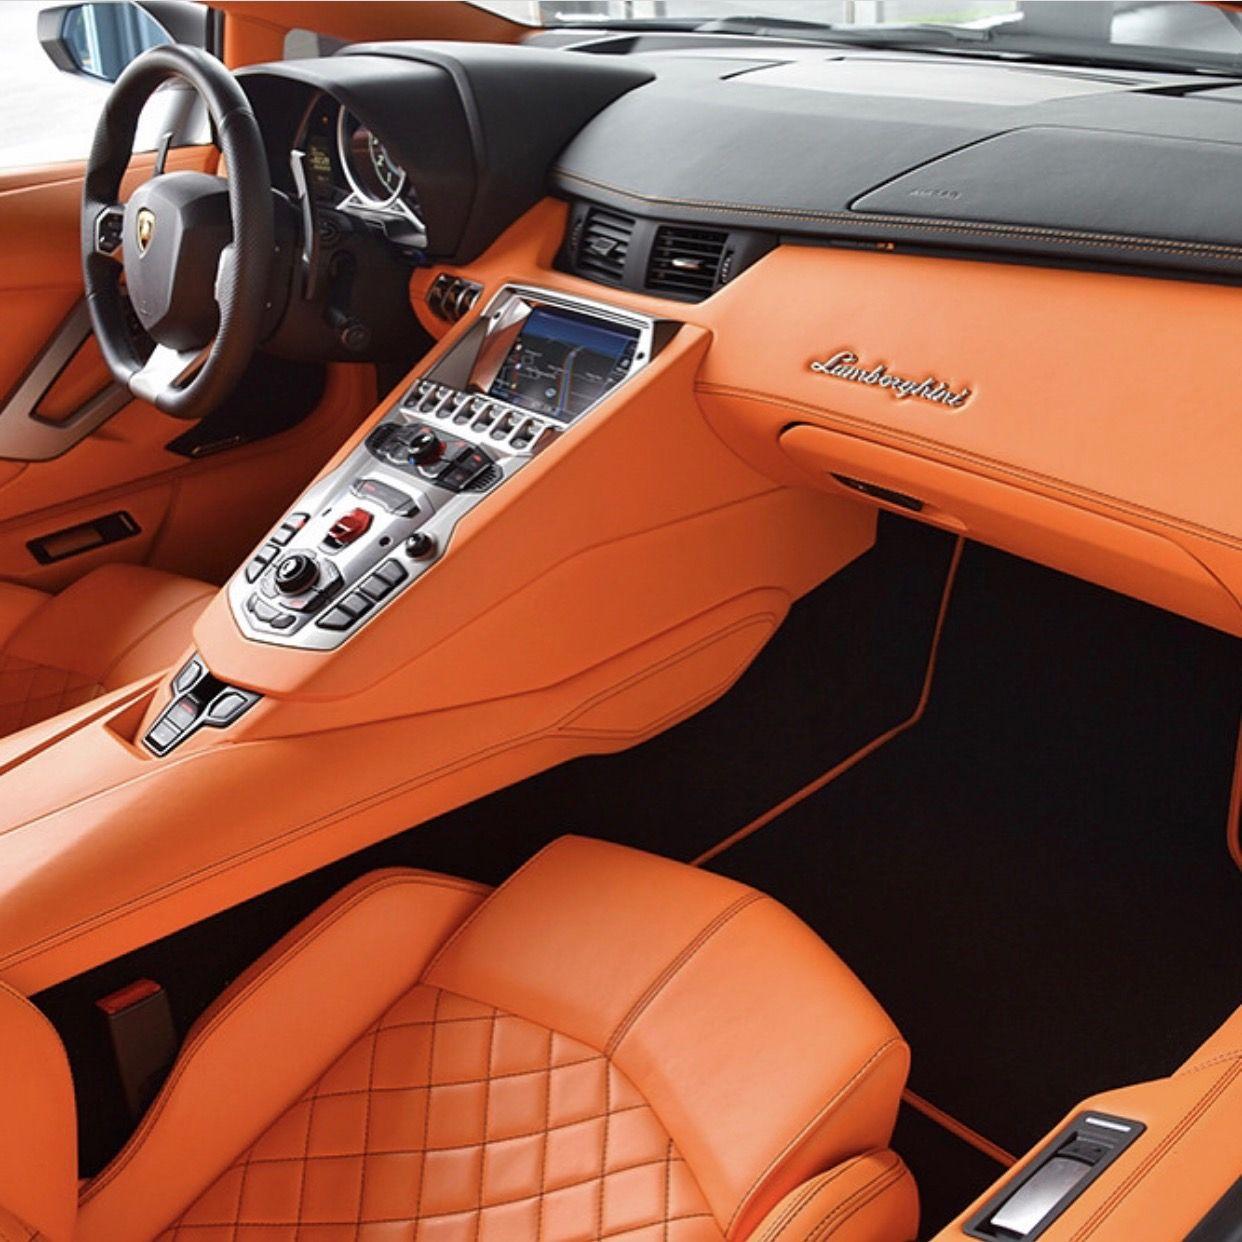 An Orange Leather Interior From A Lamborghini Aventador